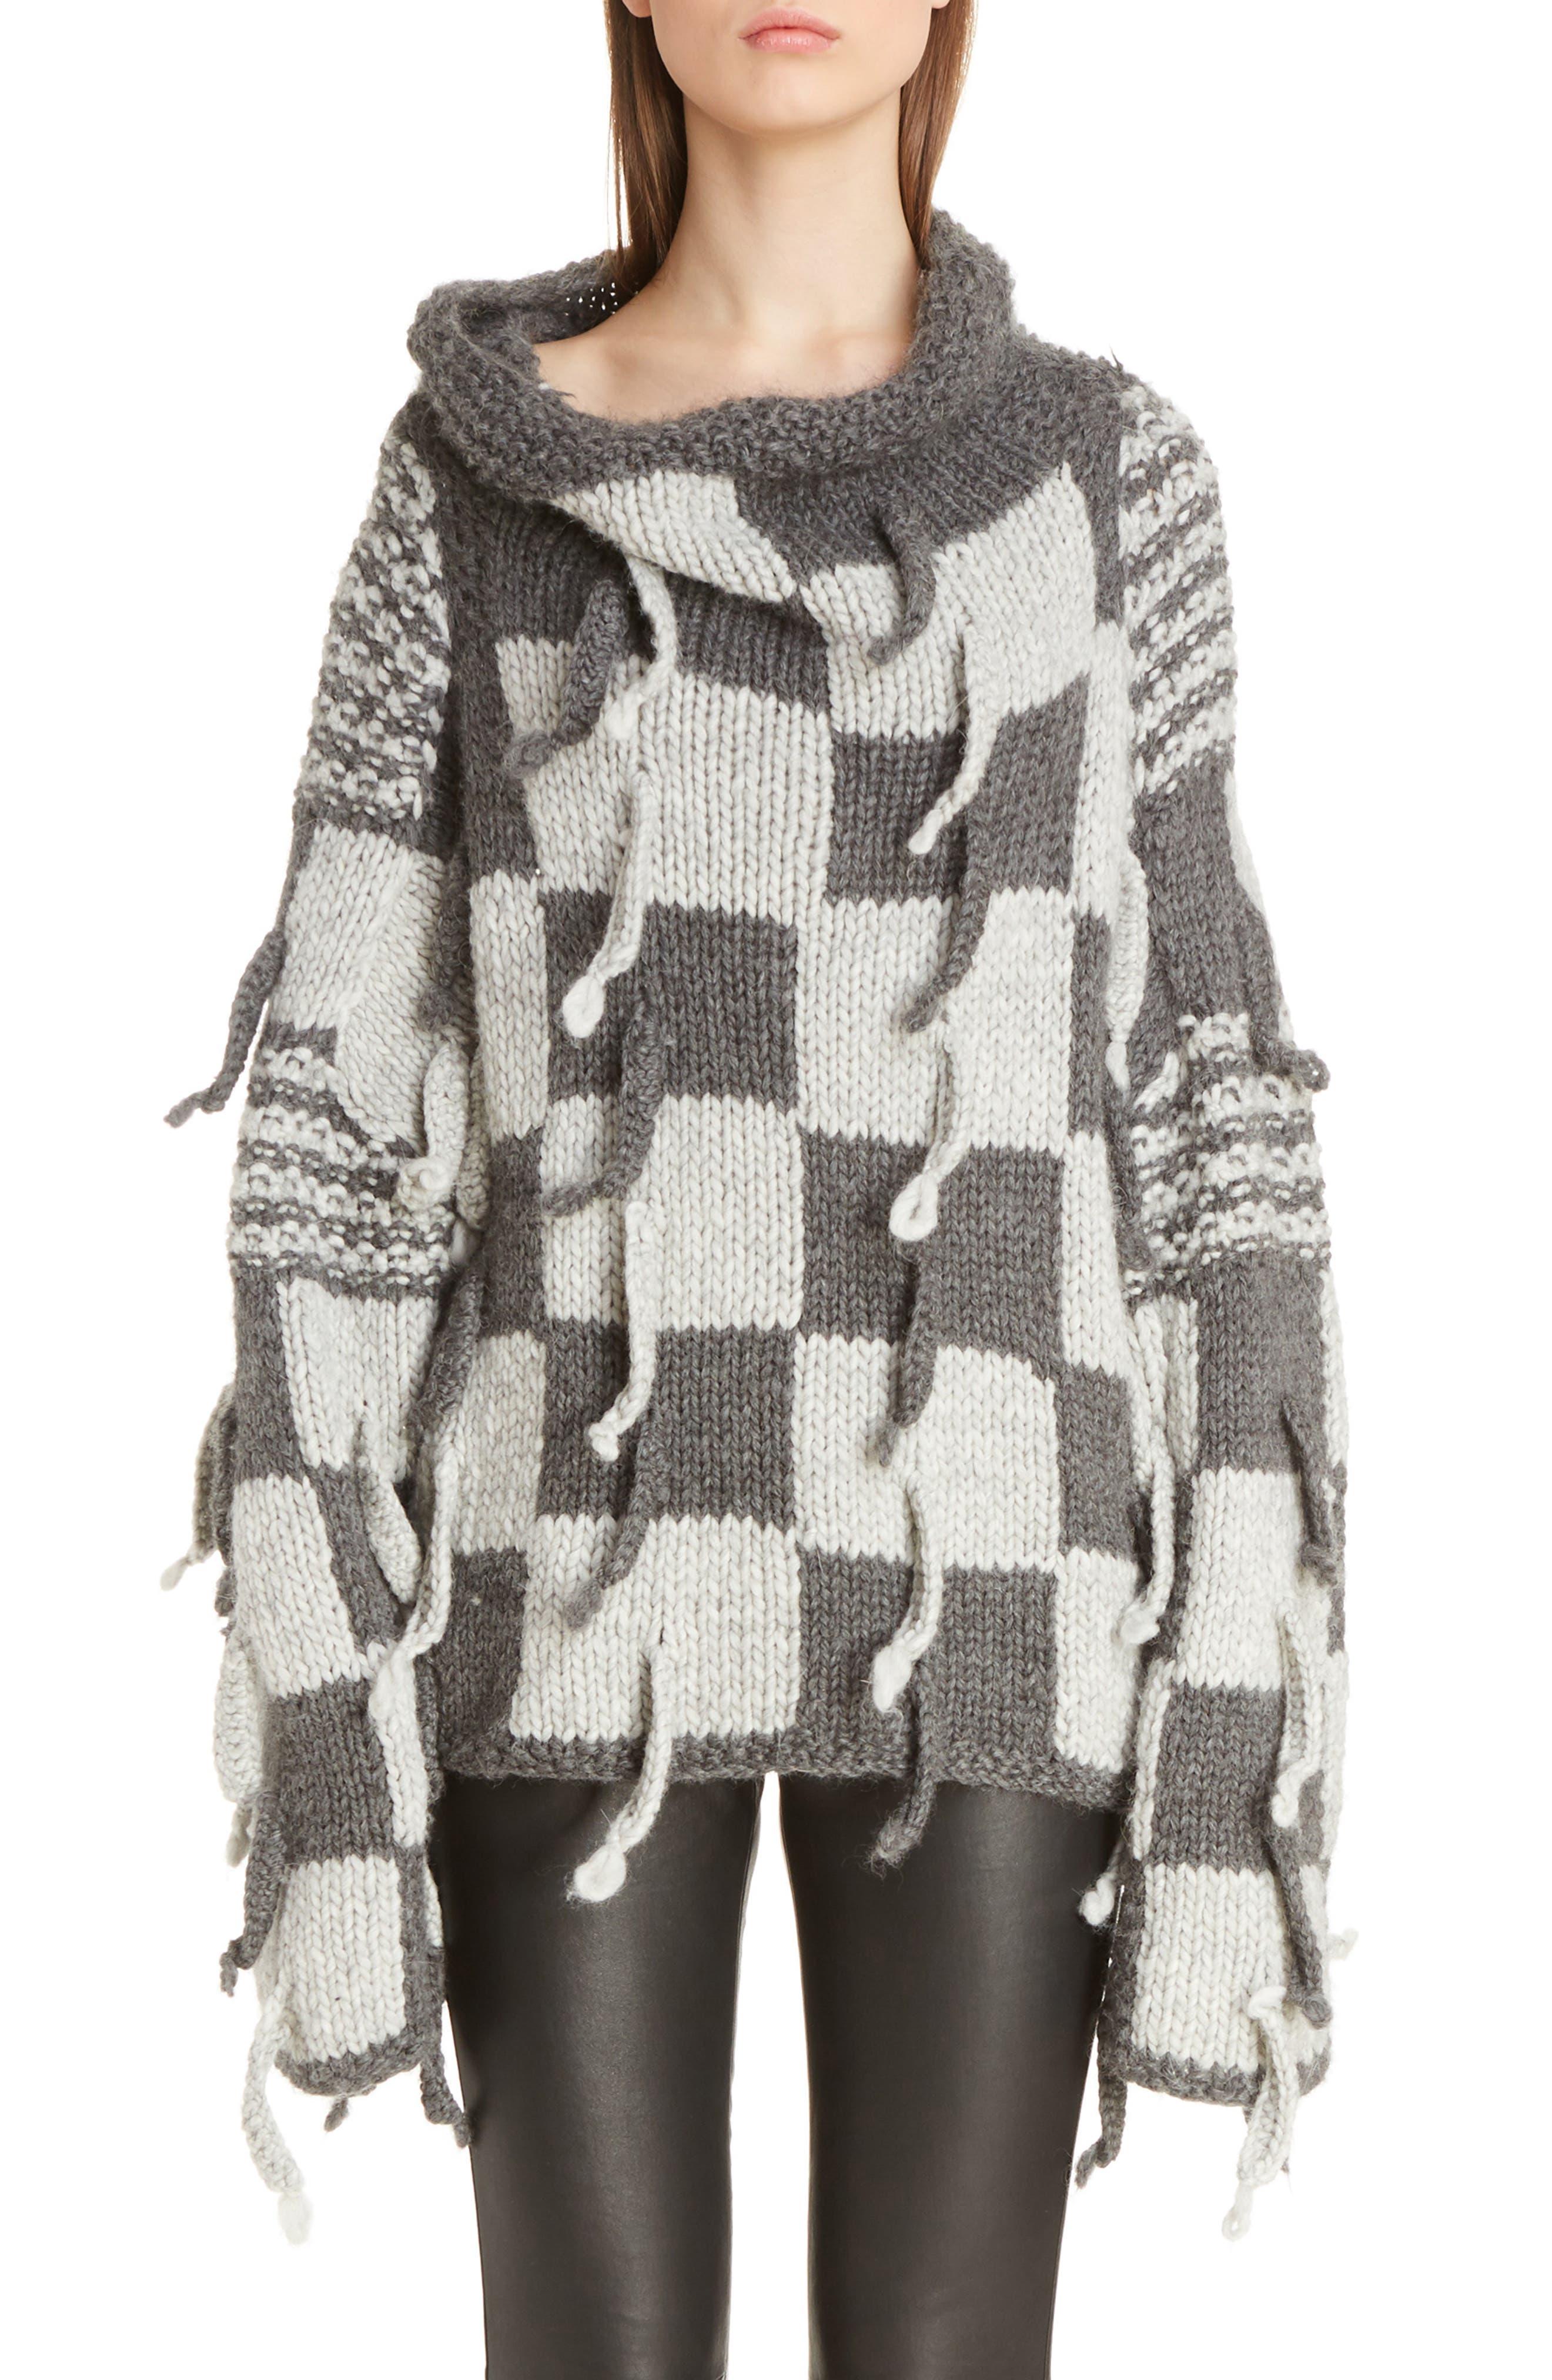 Main Image - Loewe Chunky Knit Wool & Alpaca Sweater